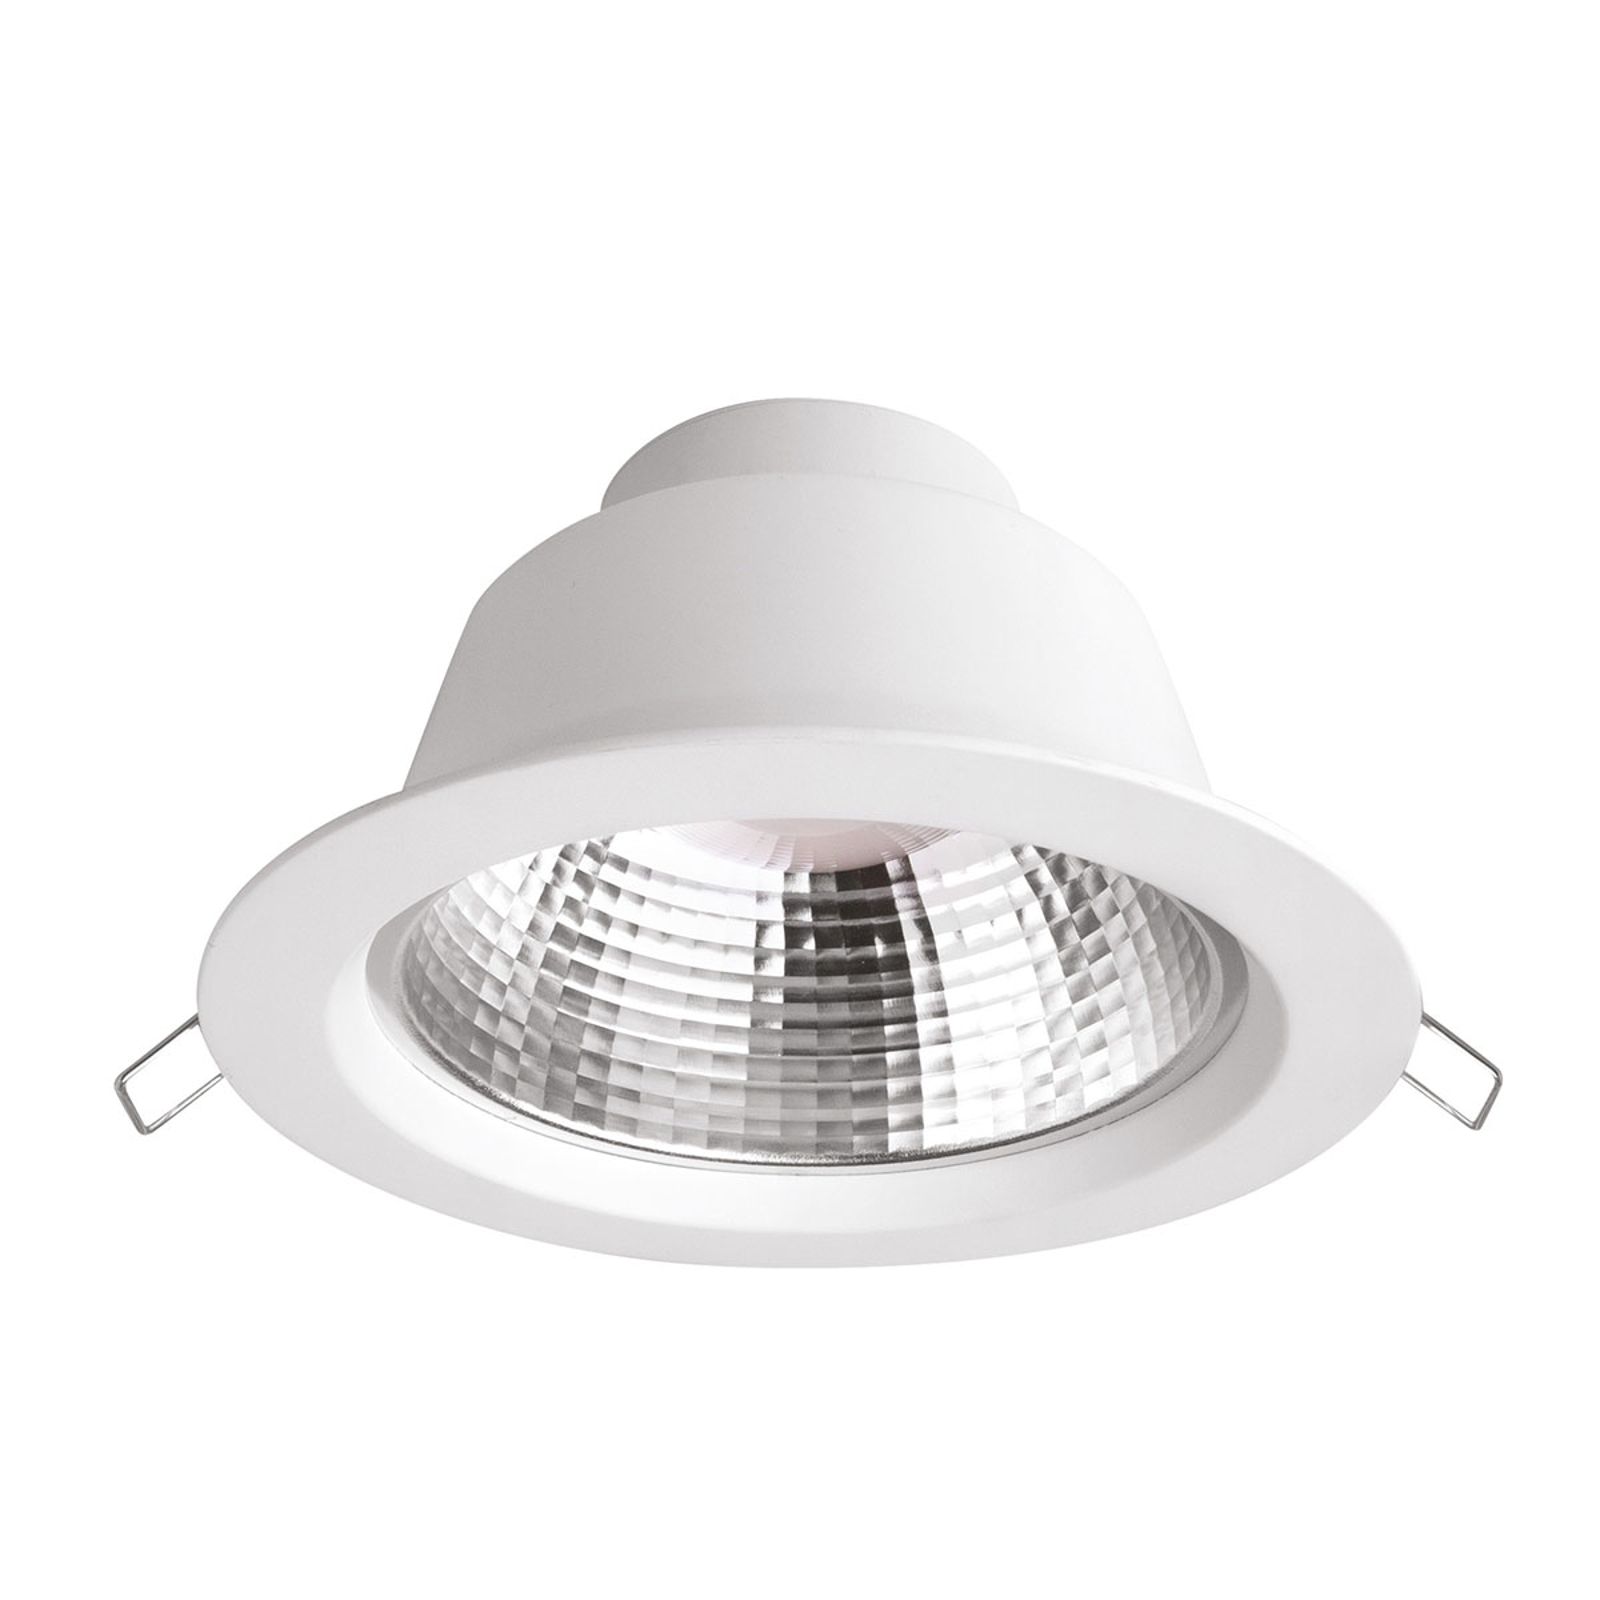 ShopLight Siena LED-indbygningslampe 9,5W, 2.800 K